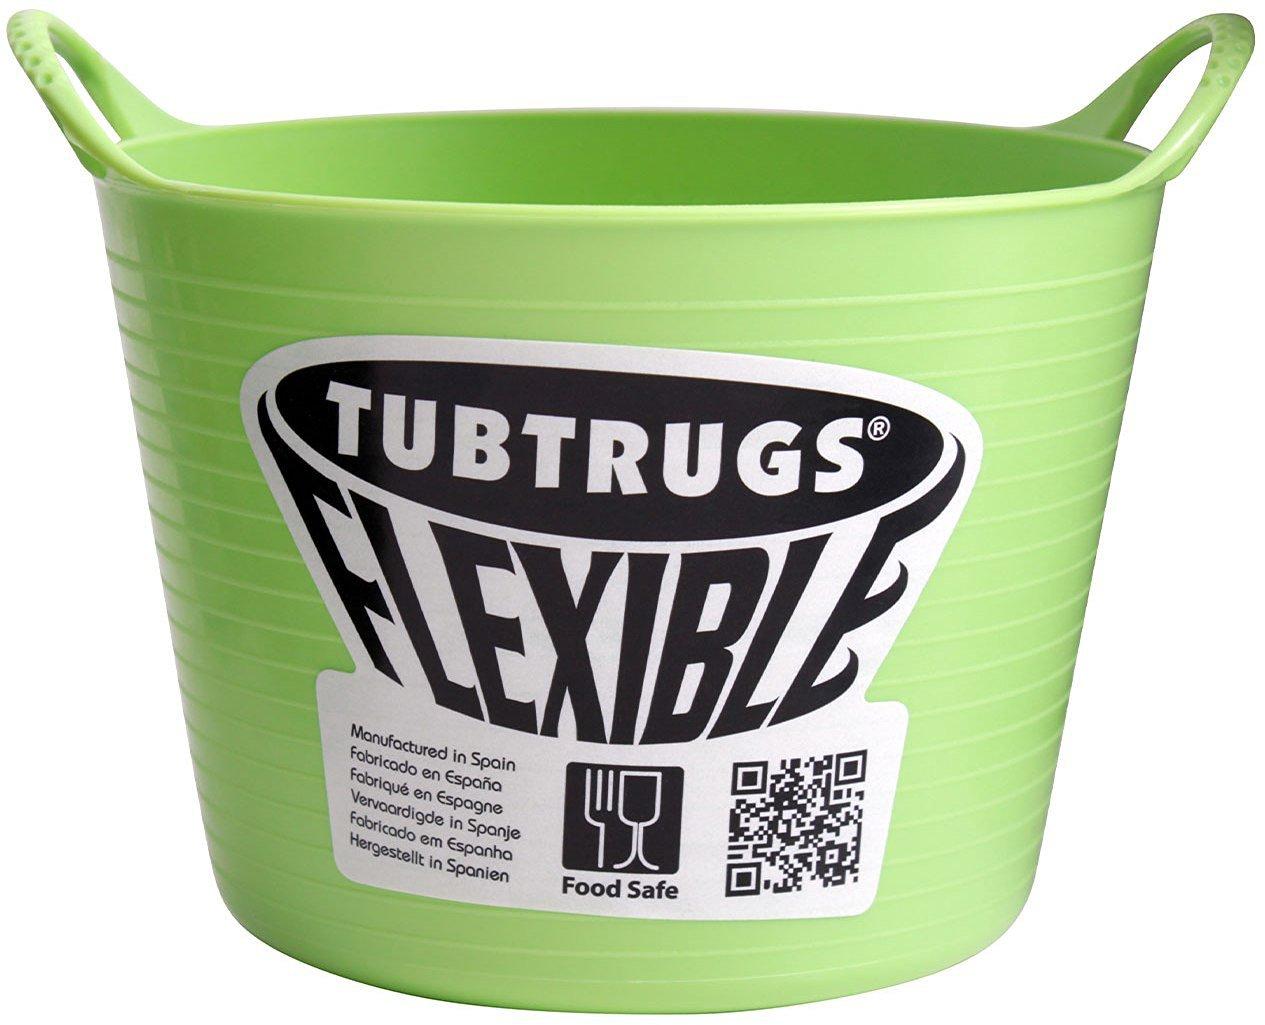 Tubtrugs SPMICPST Flexible Pistachio Micro .37 Liter/12.5 Ounce Capacity